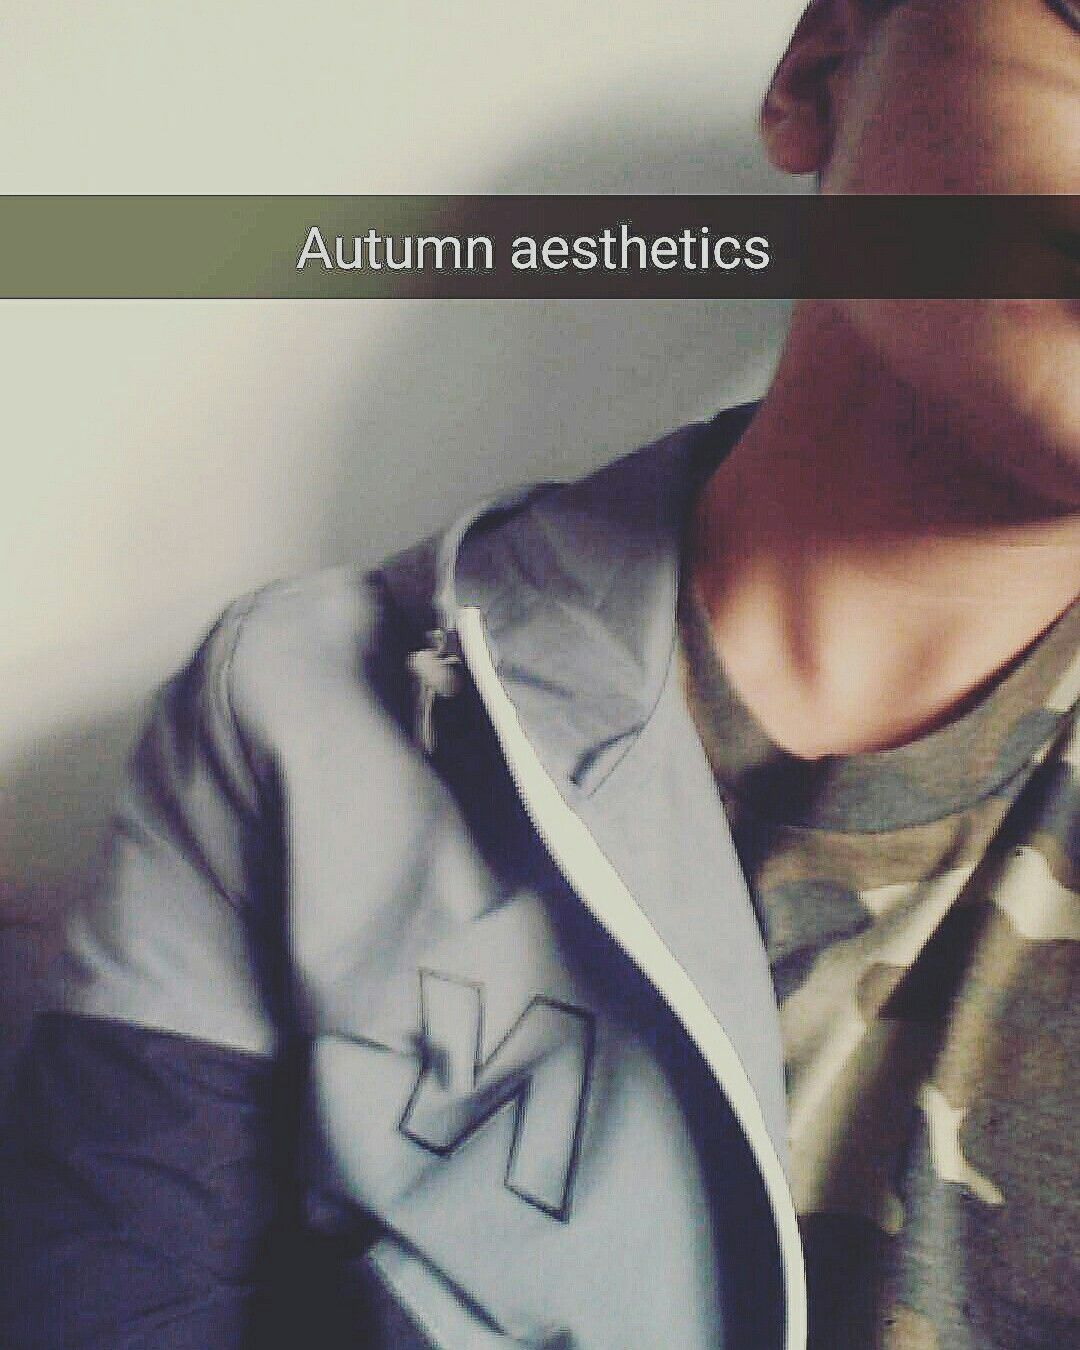 Autumn is my fashion season  teen boys fashion